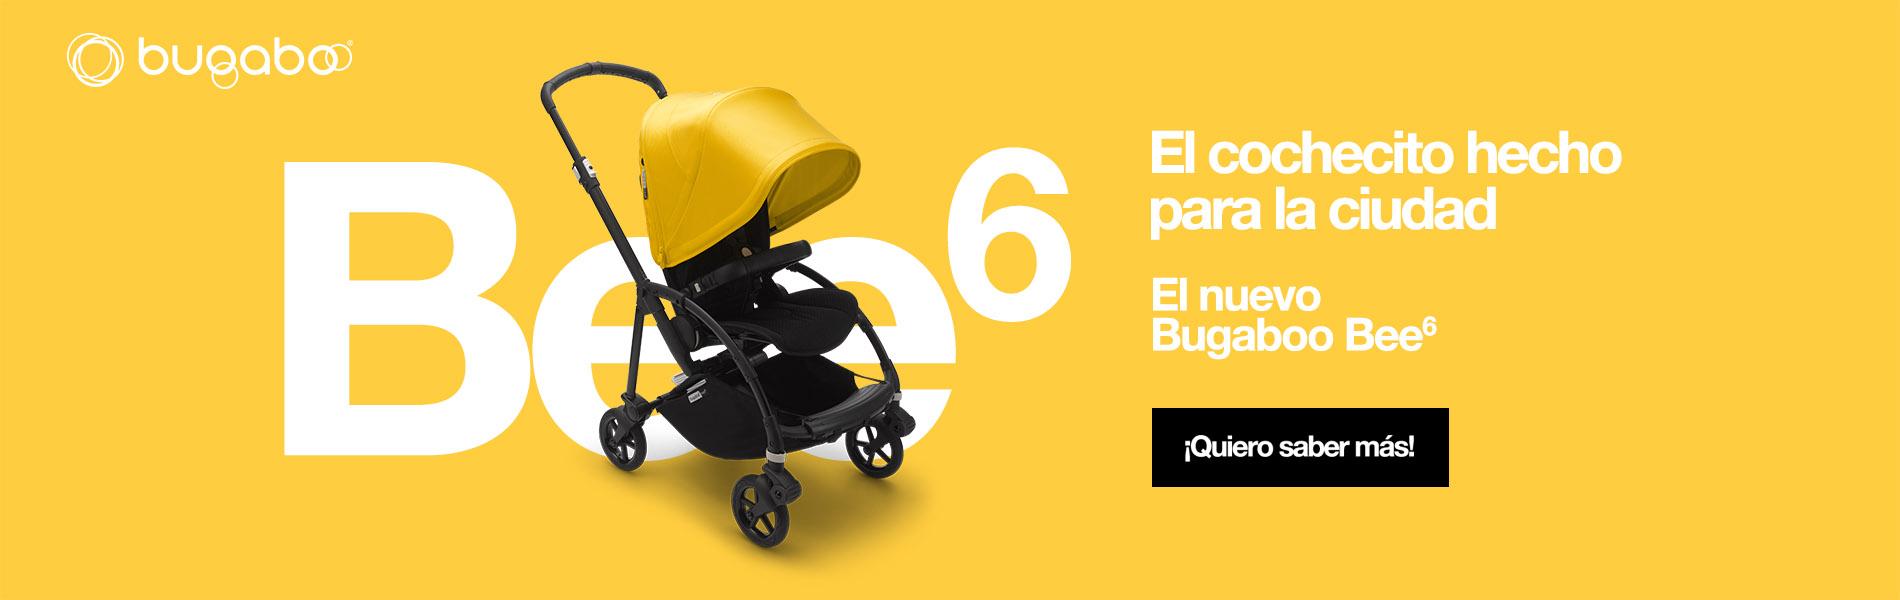 Bugaboo bee 6 banner web